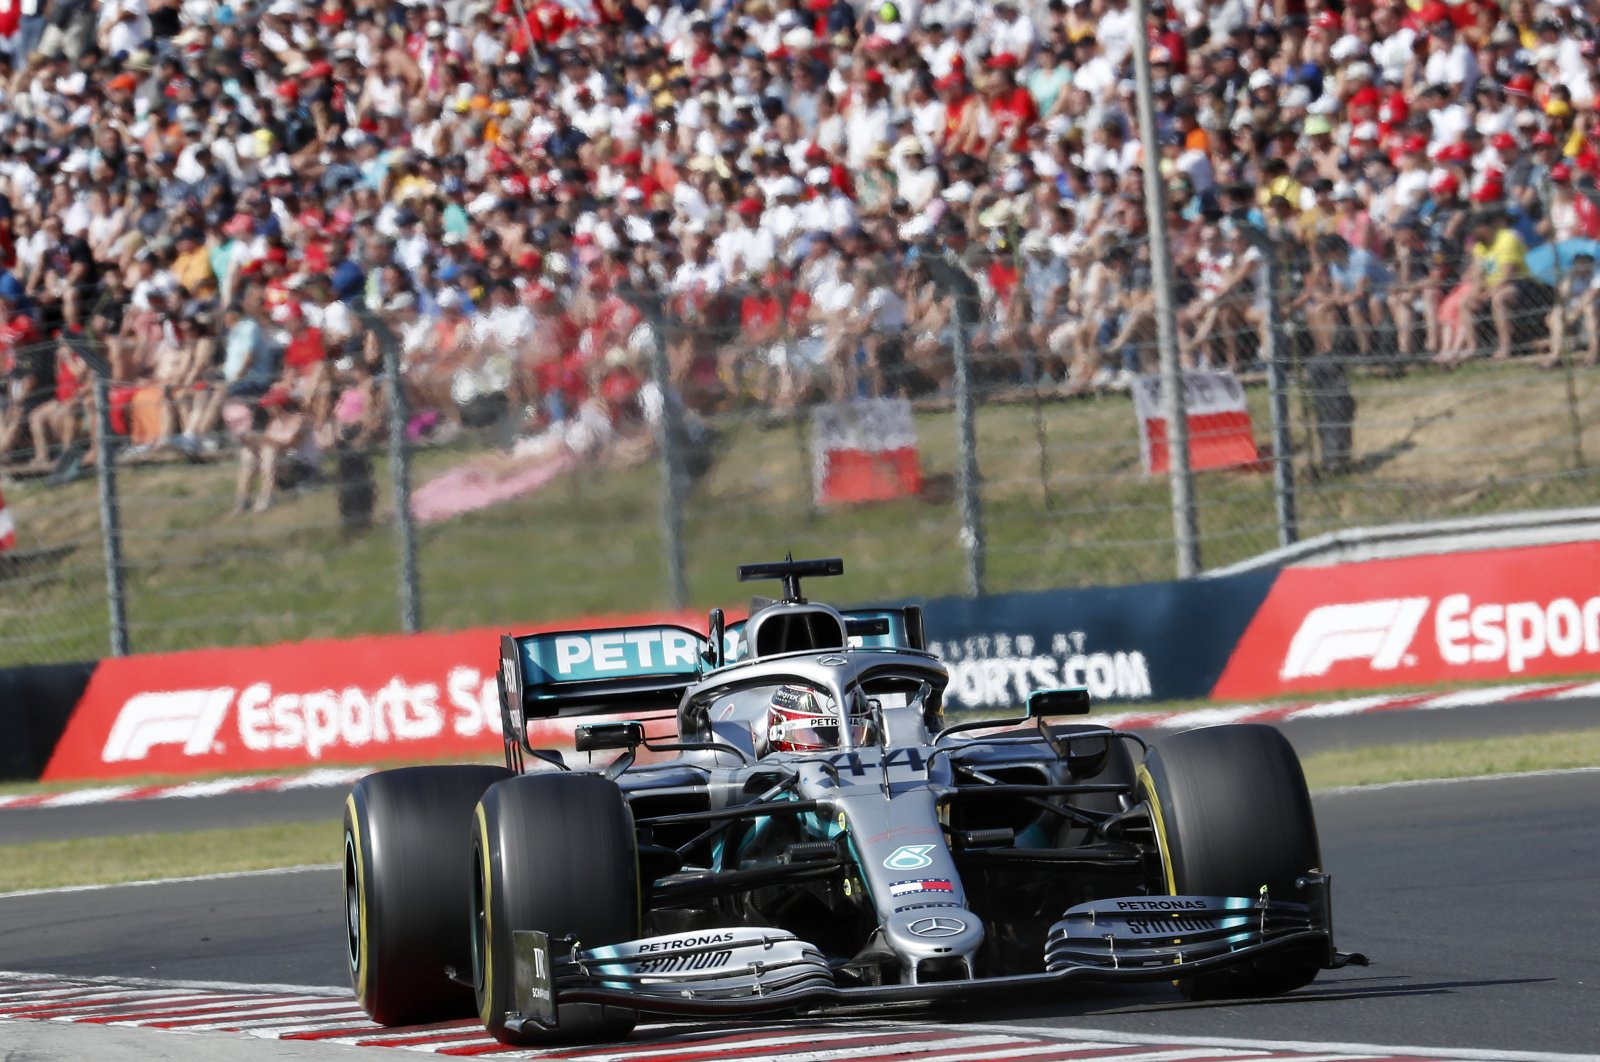 Mercedes driver Lewis Hamilton during the Hungarian GP in Mogyorod, Hungary, Aug. 4, 2019. (AP Photo)